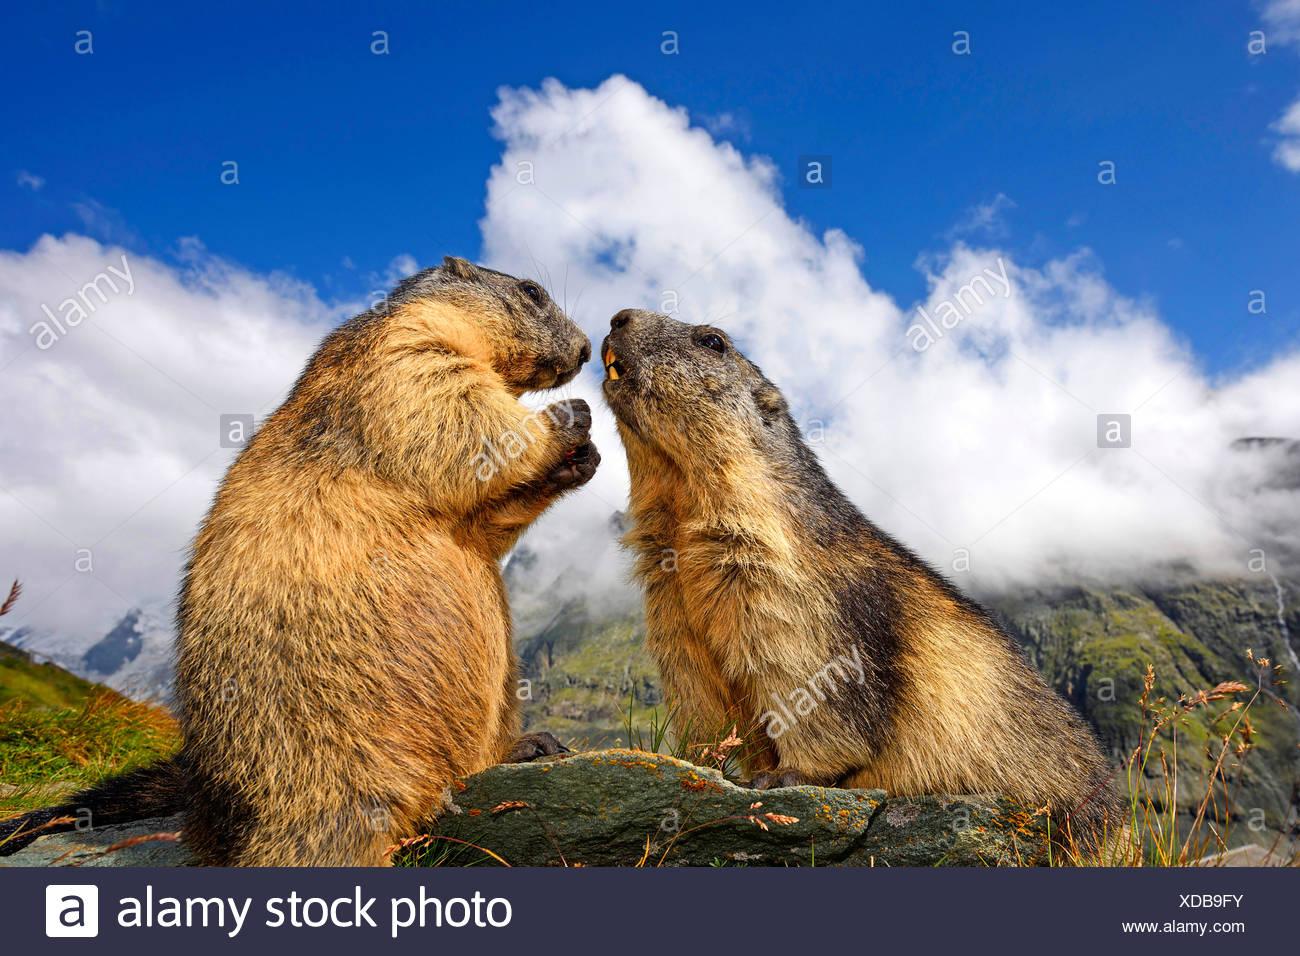 Alpenmurmeltier, Alpen-Murmeltier (Marmota Marmota), Zwei Murmeltiere Begruessen Einander, Italienisch | Alpen-Murmeltier (Marmota marm Stockbild